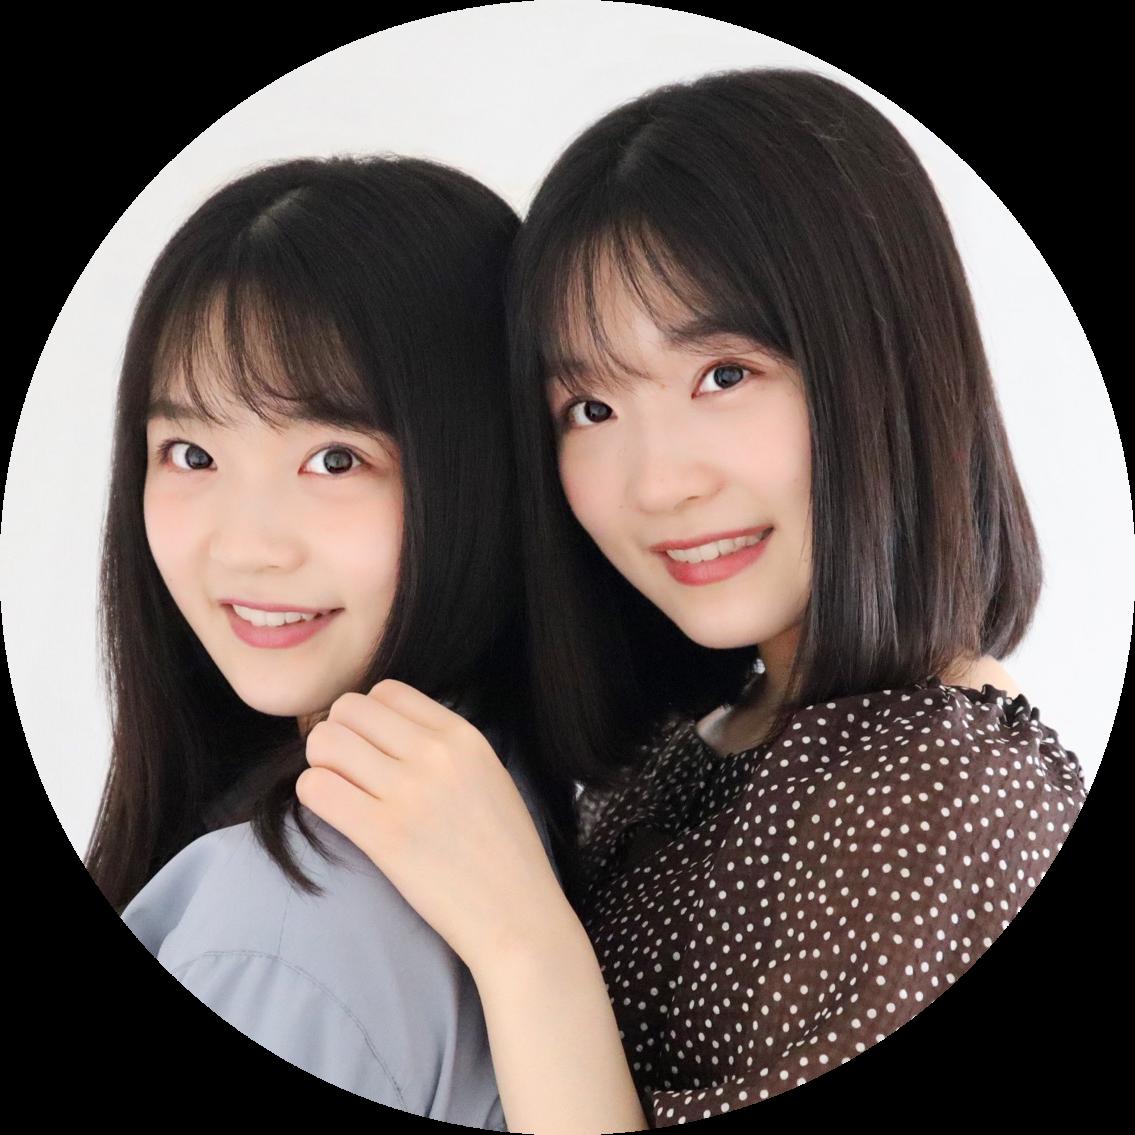 @mikotone Profile Image | Linktree